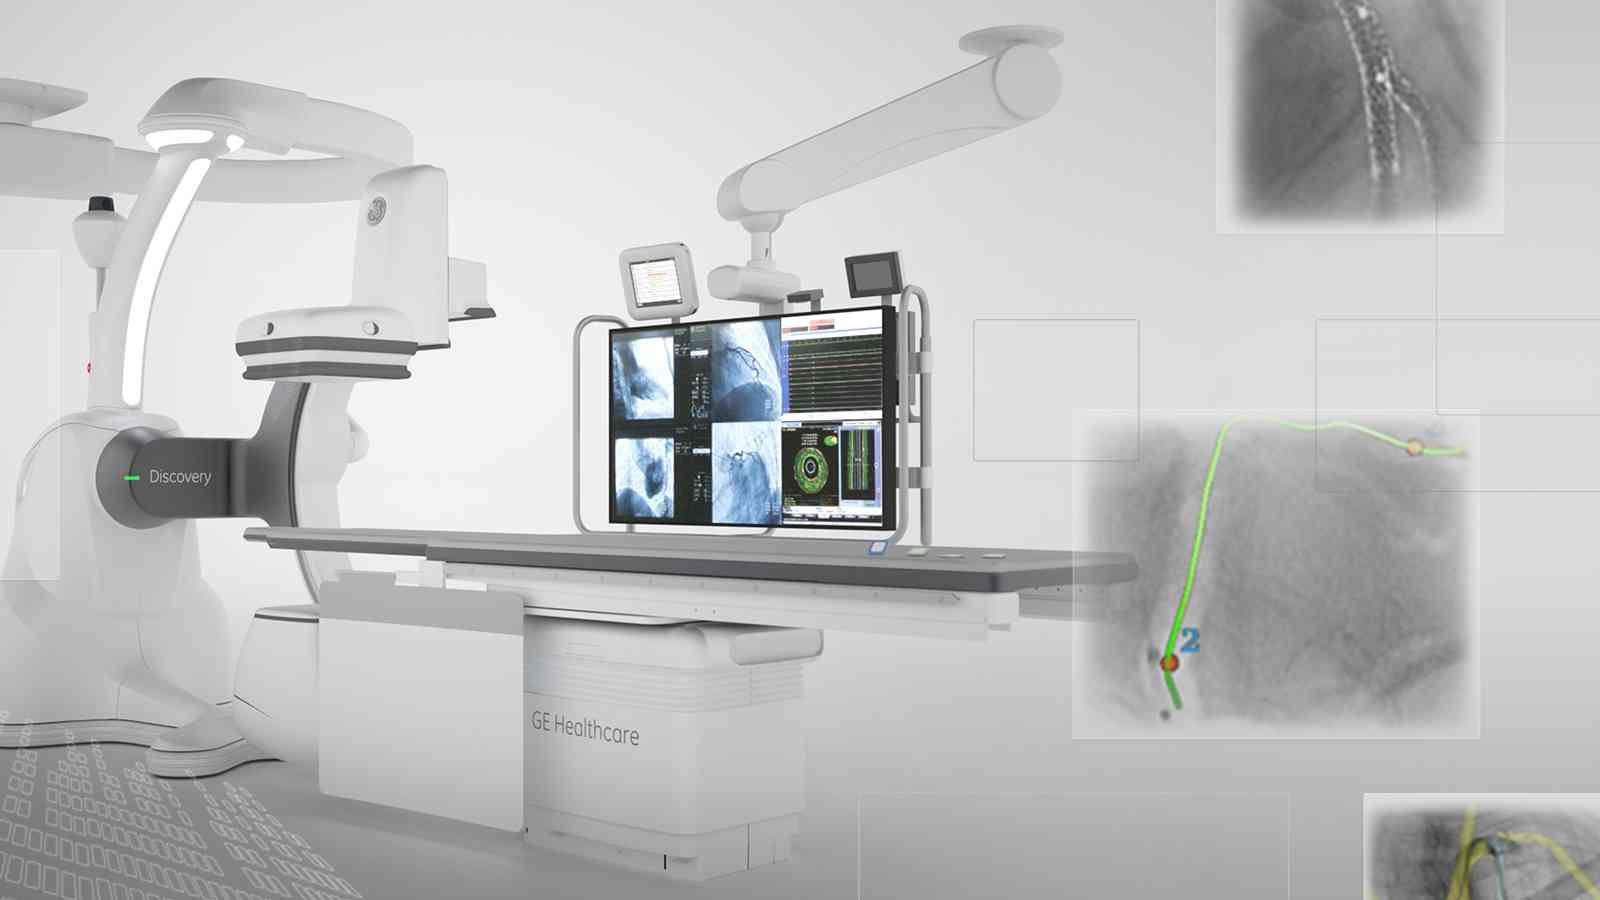 GE电生理设备在临床中的应用